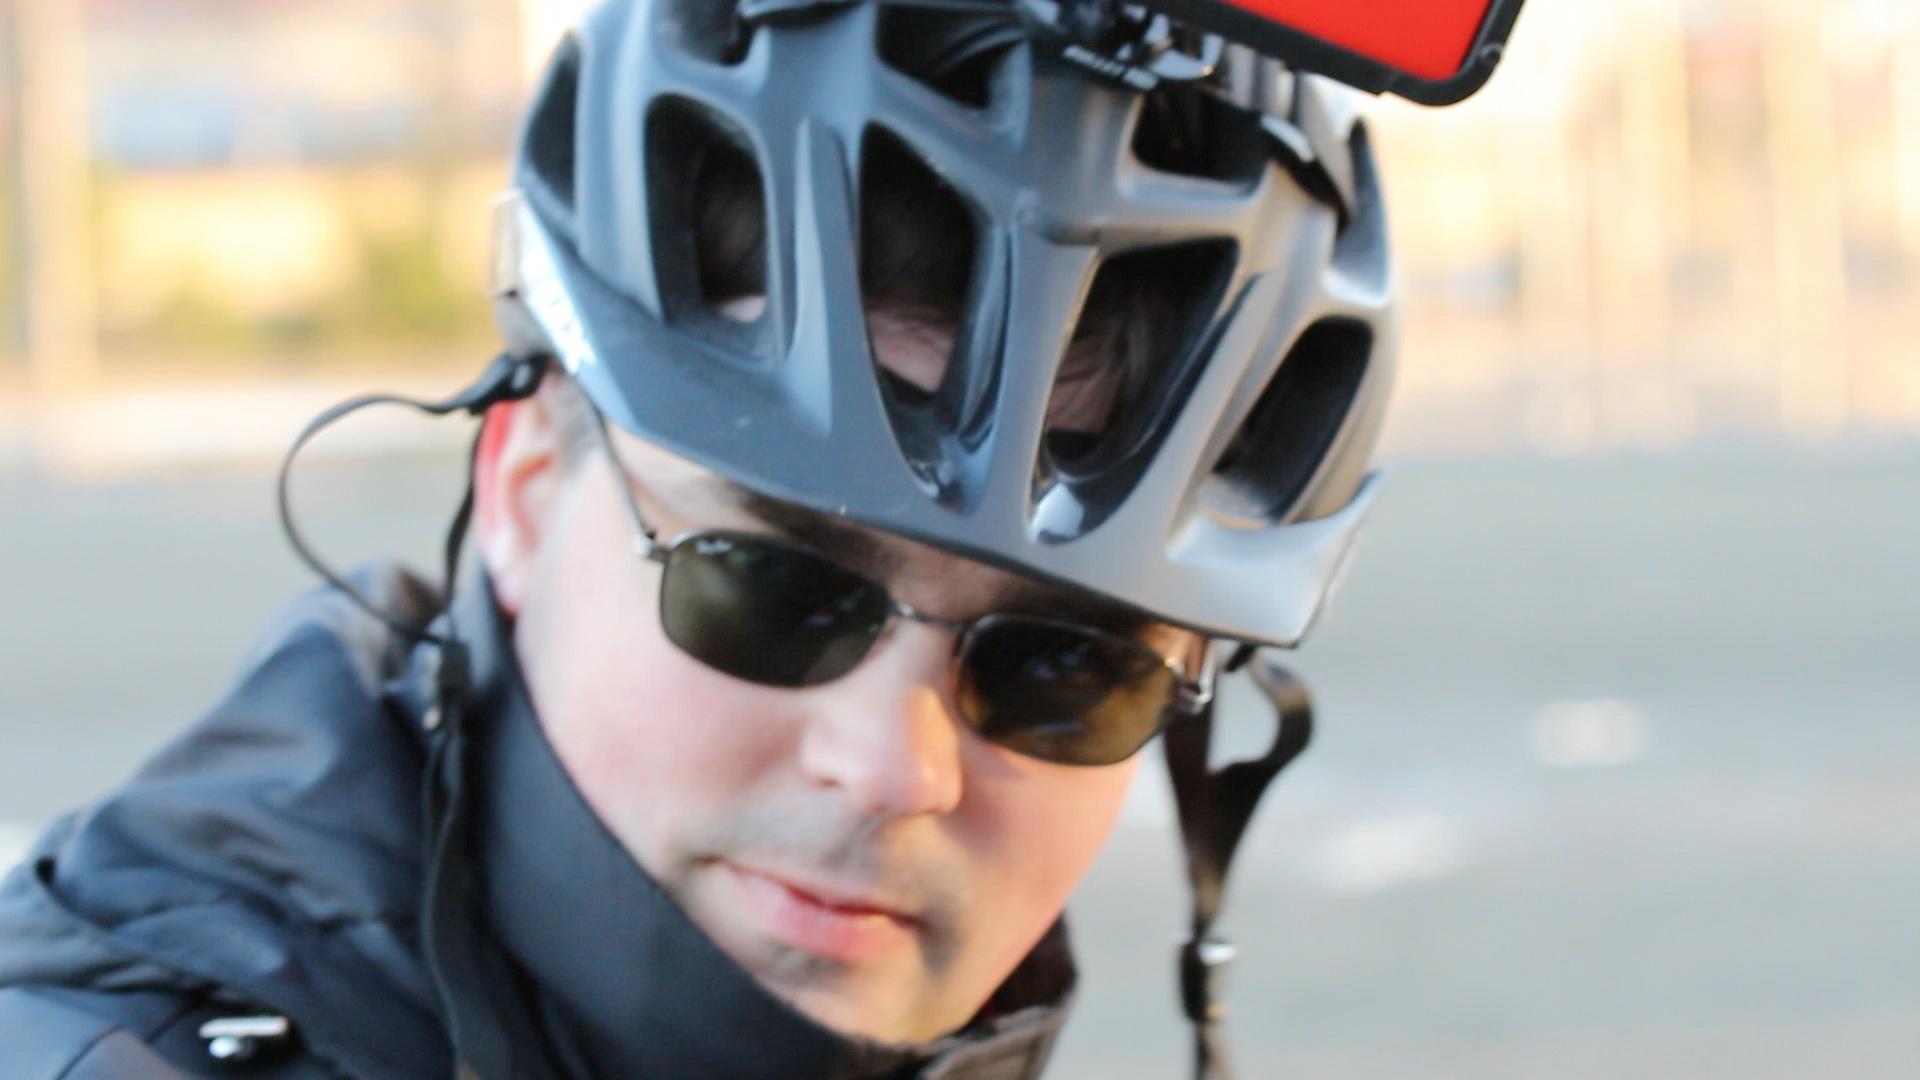 Henri with his 3D-printed Nokia 1020 helmet mount